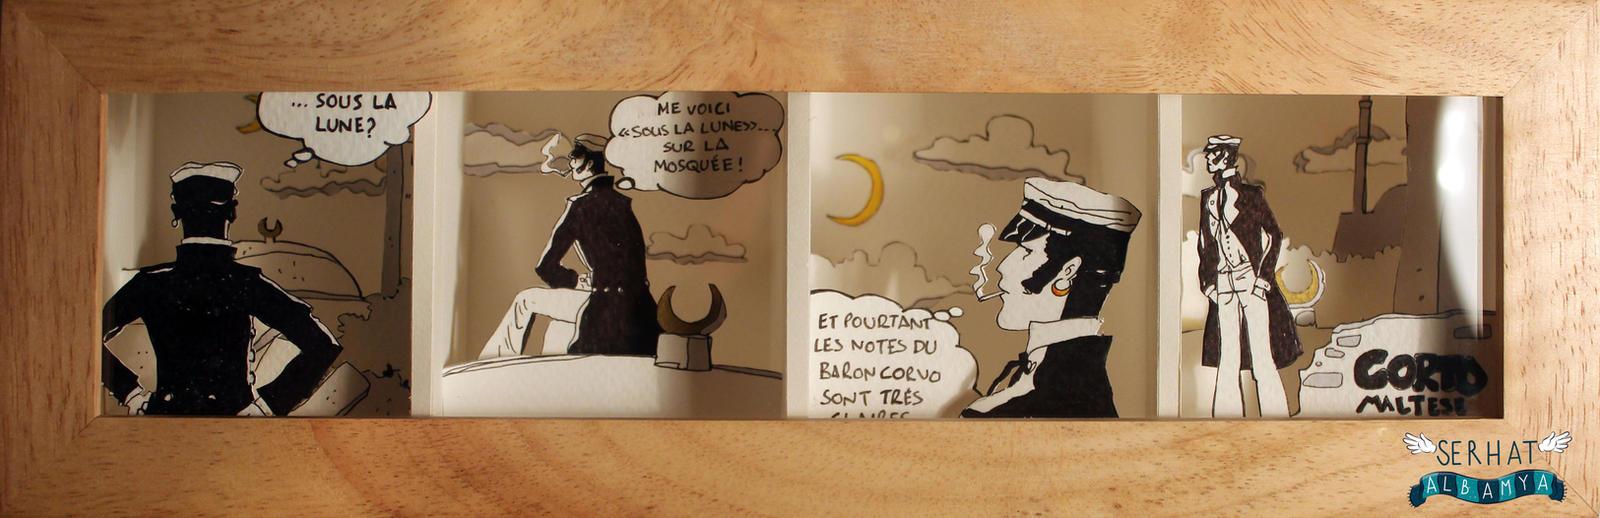 La luna by serhatalbamya